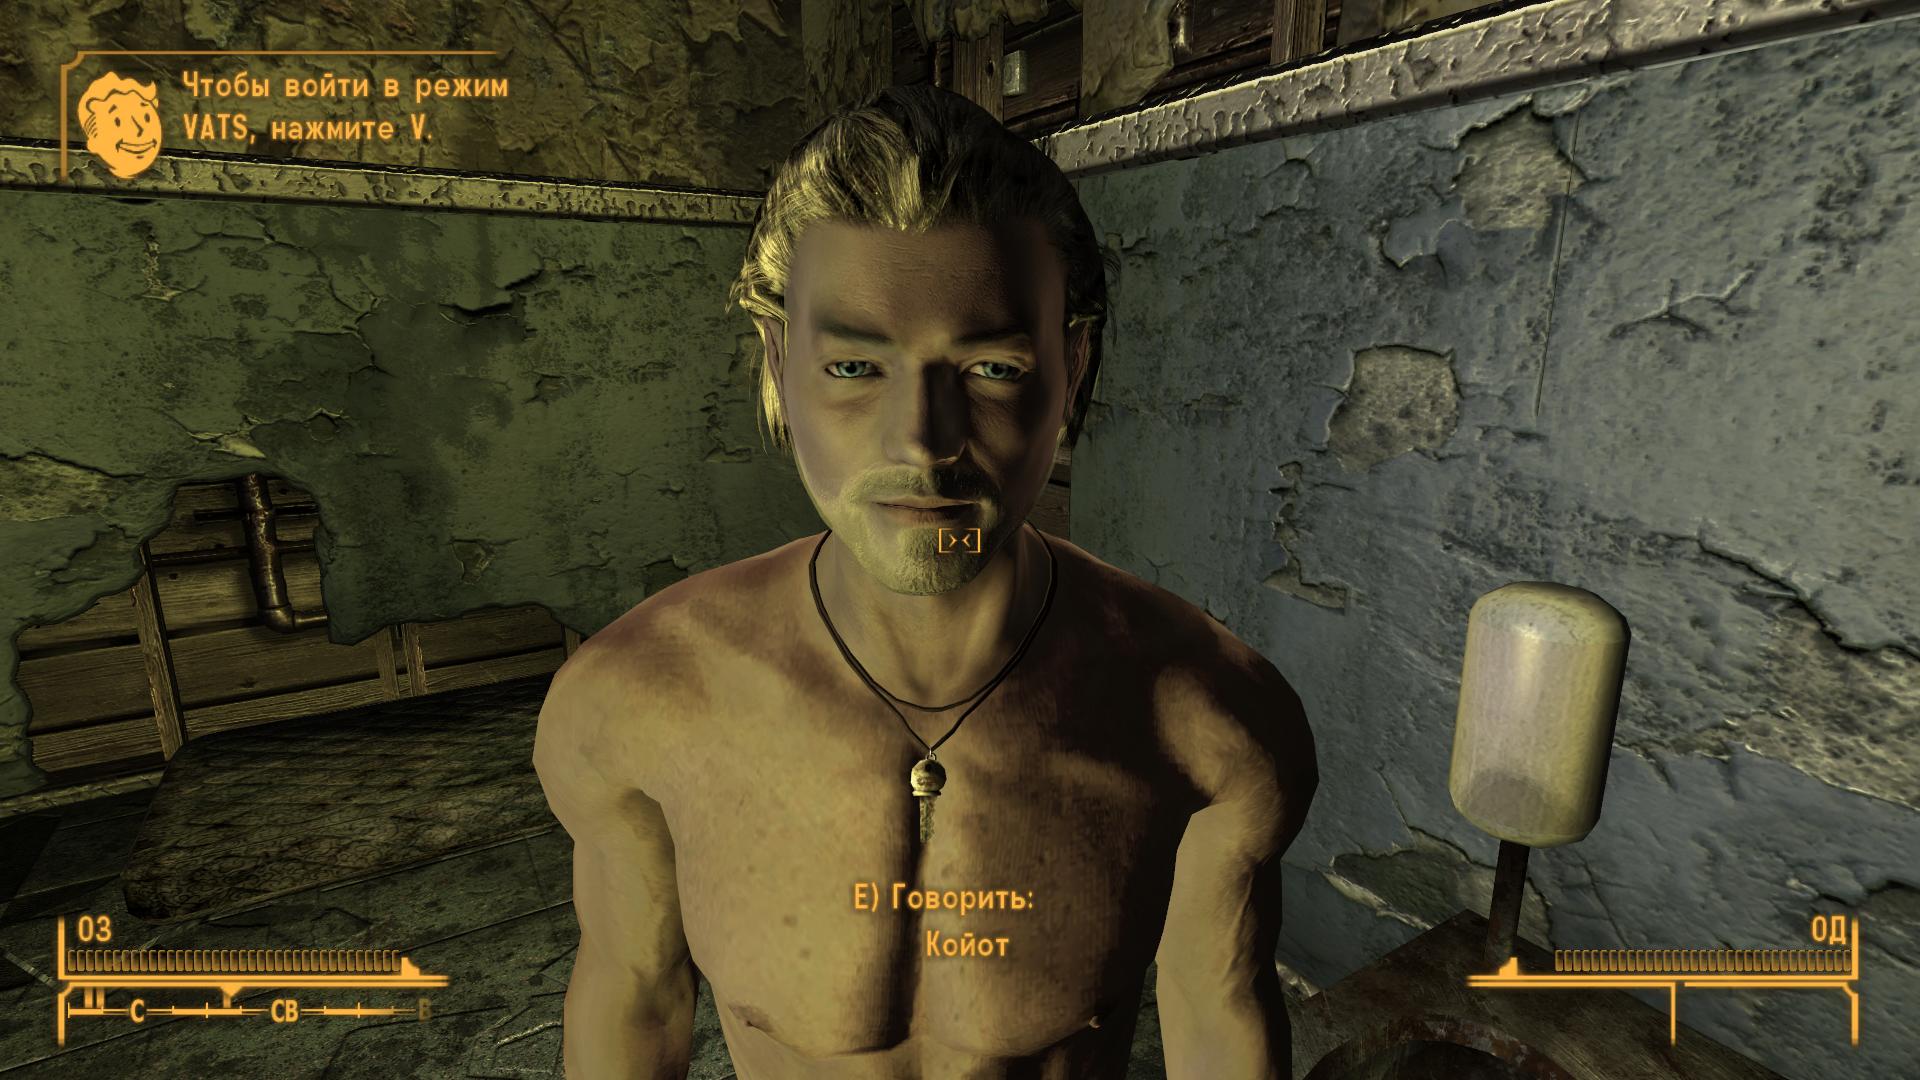 Fallout - New Vegas Screenshot 2018.10.25 - 20.18.29.69.png